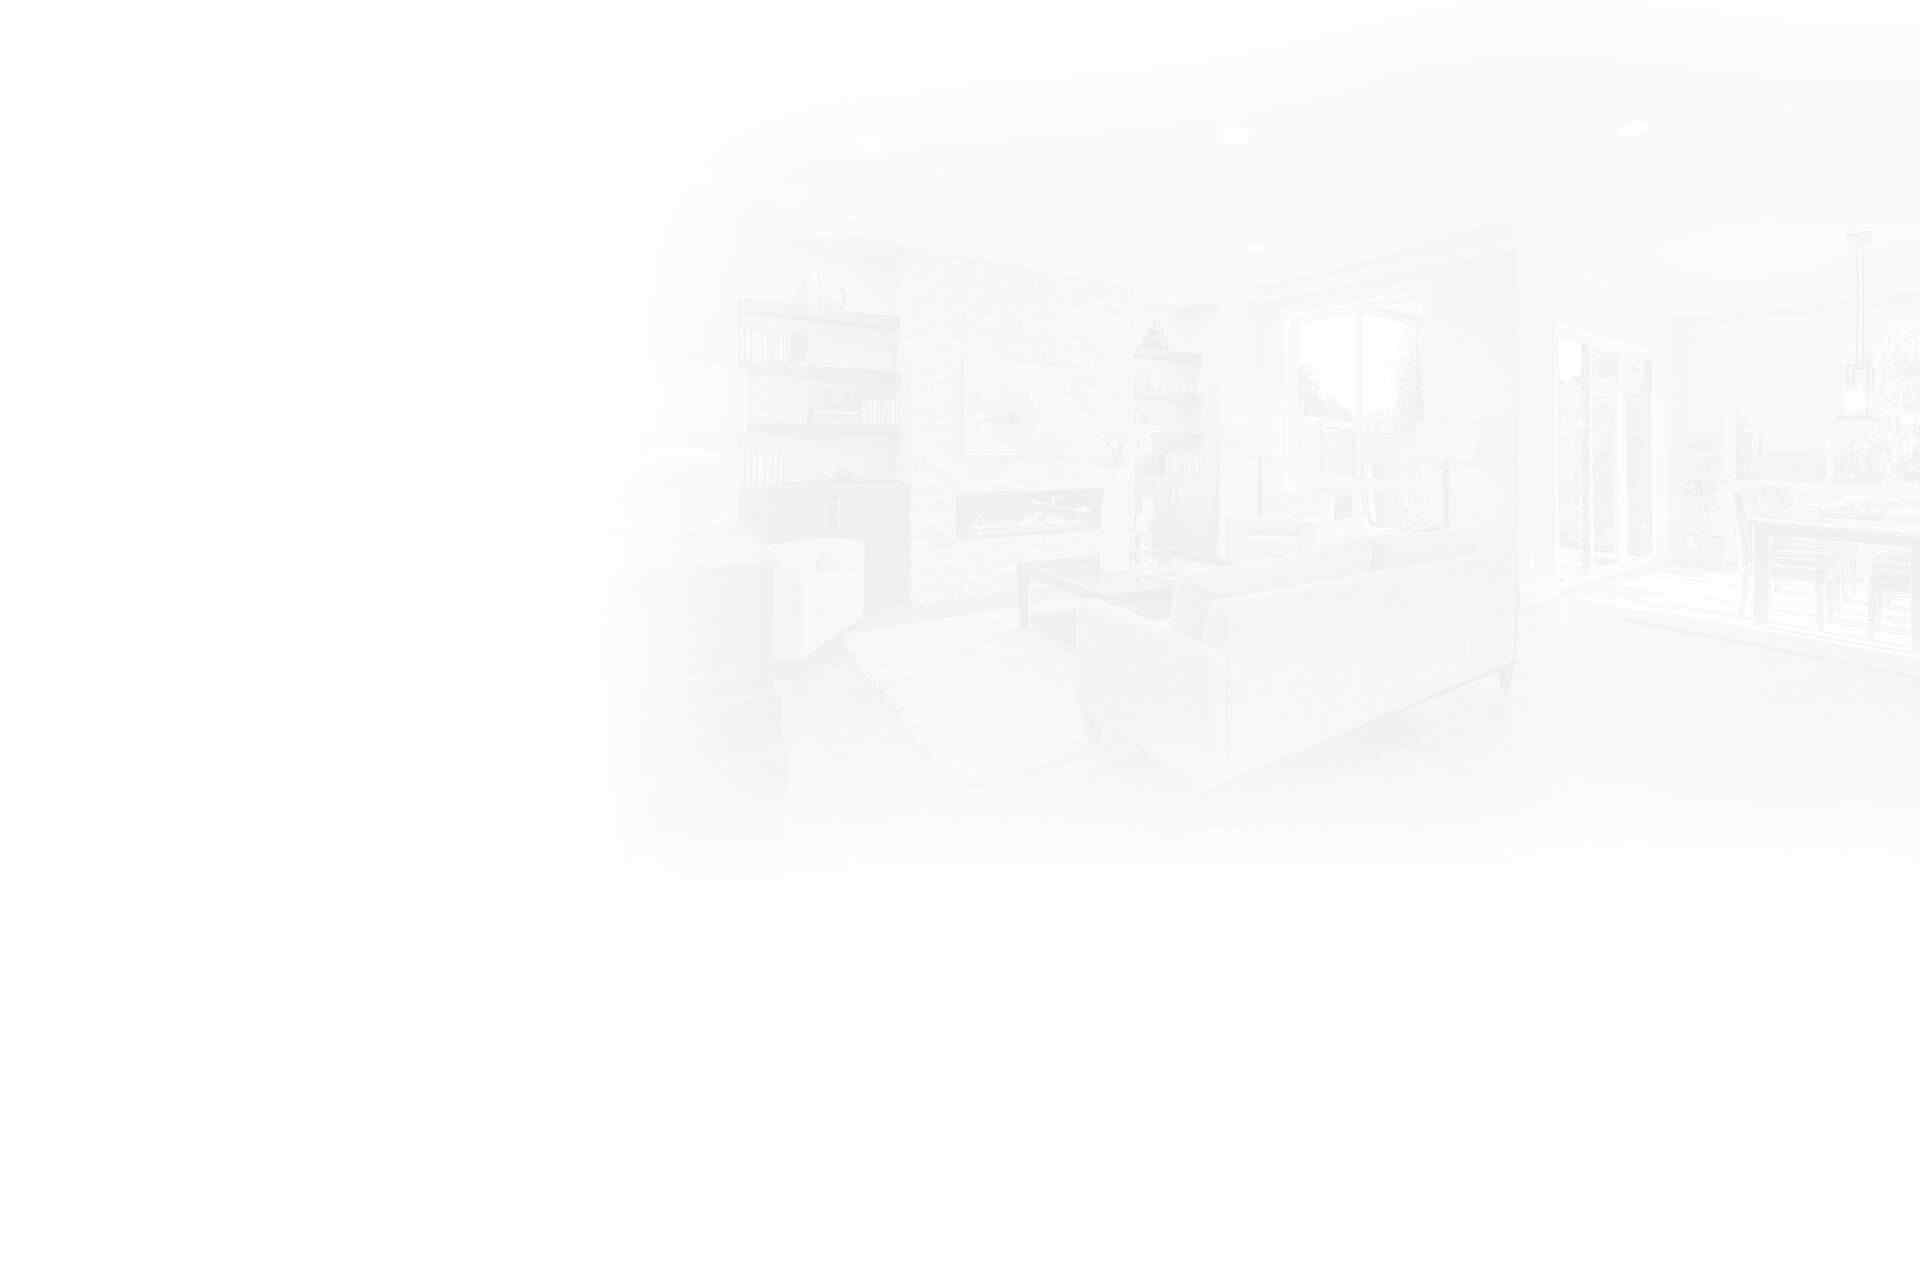 https://mister-solucion.com/wp-content/uploads/2018/10/background_grayscale_03.jpg